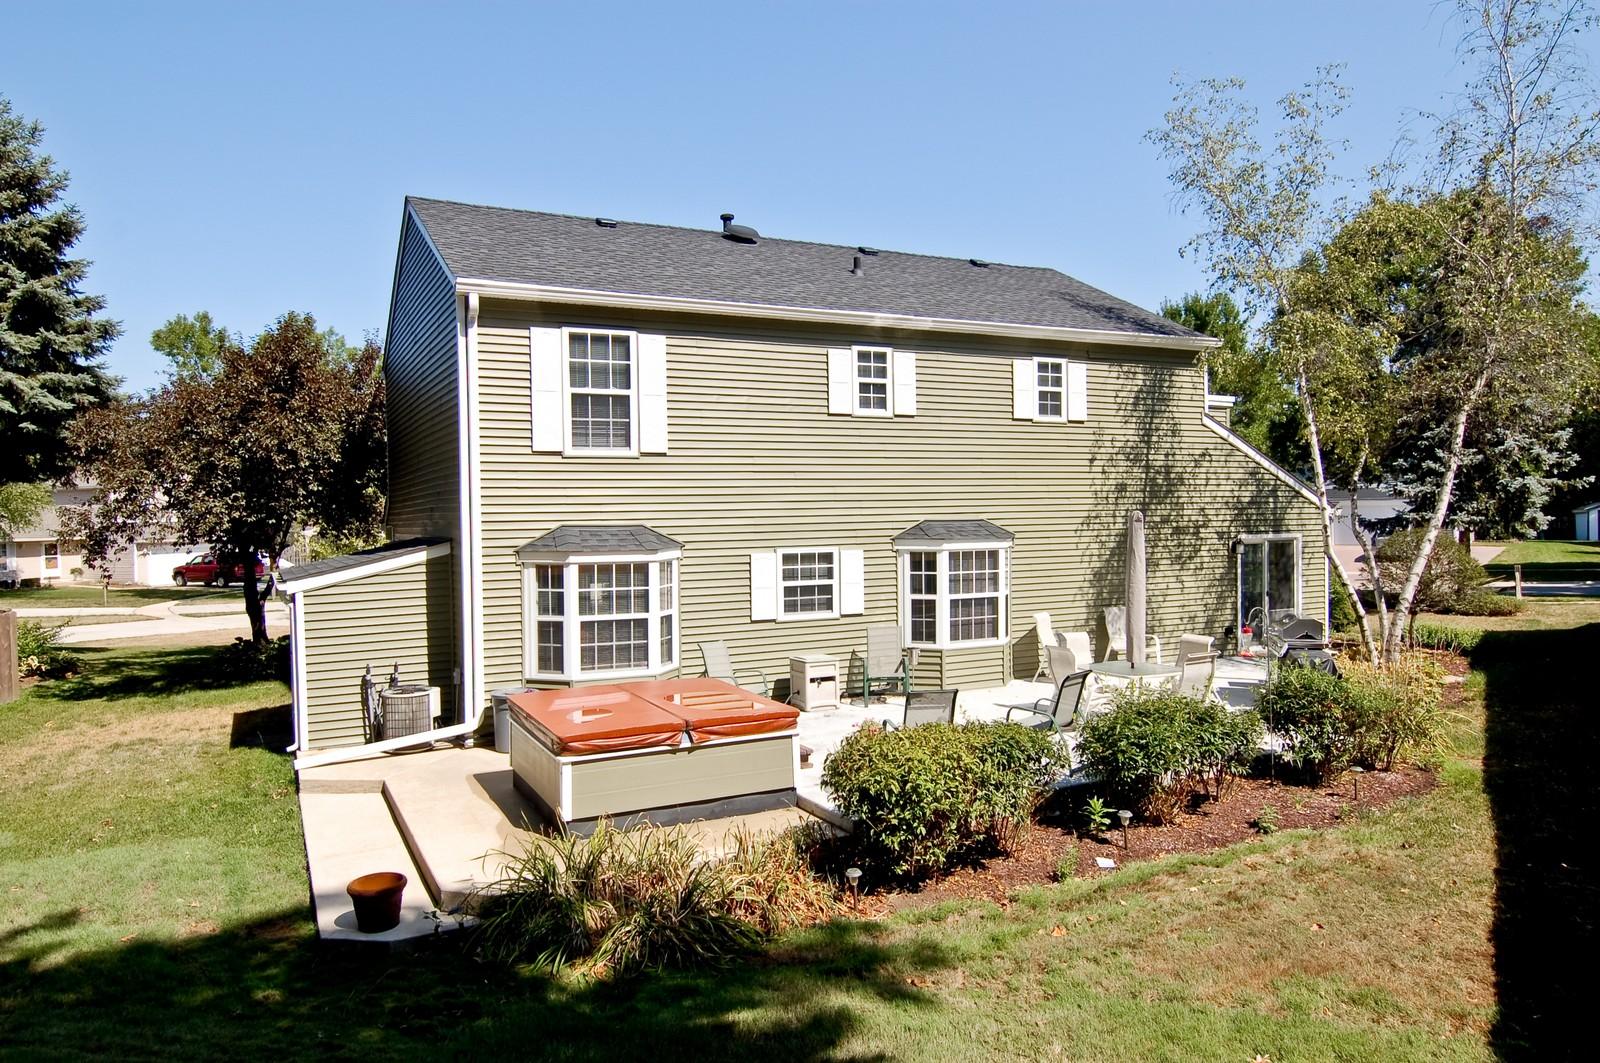 Real Estate Photography - 315 Kensington, Streamwood, IL, 60107 - Rear View